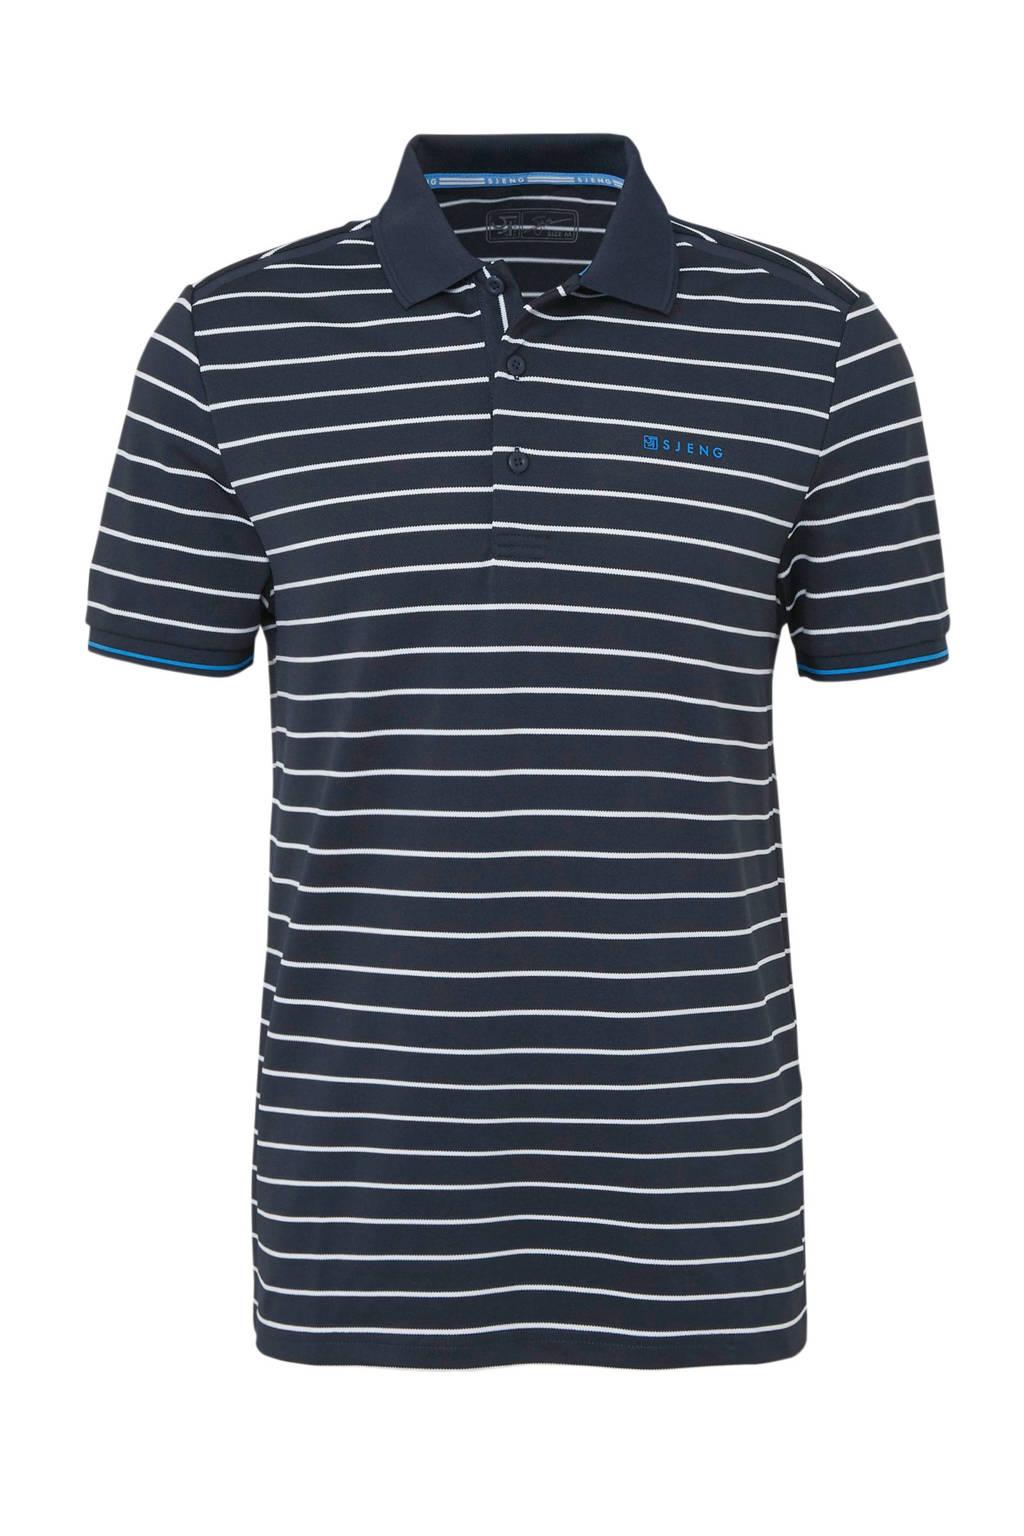 Sjeng Sports   polo donkerblauw/wit, Donkerblauw/wit